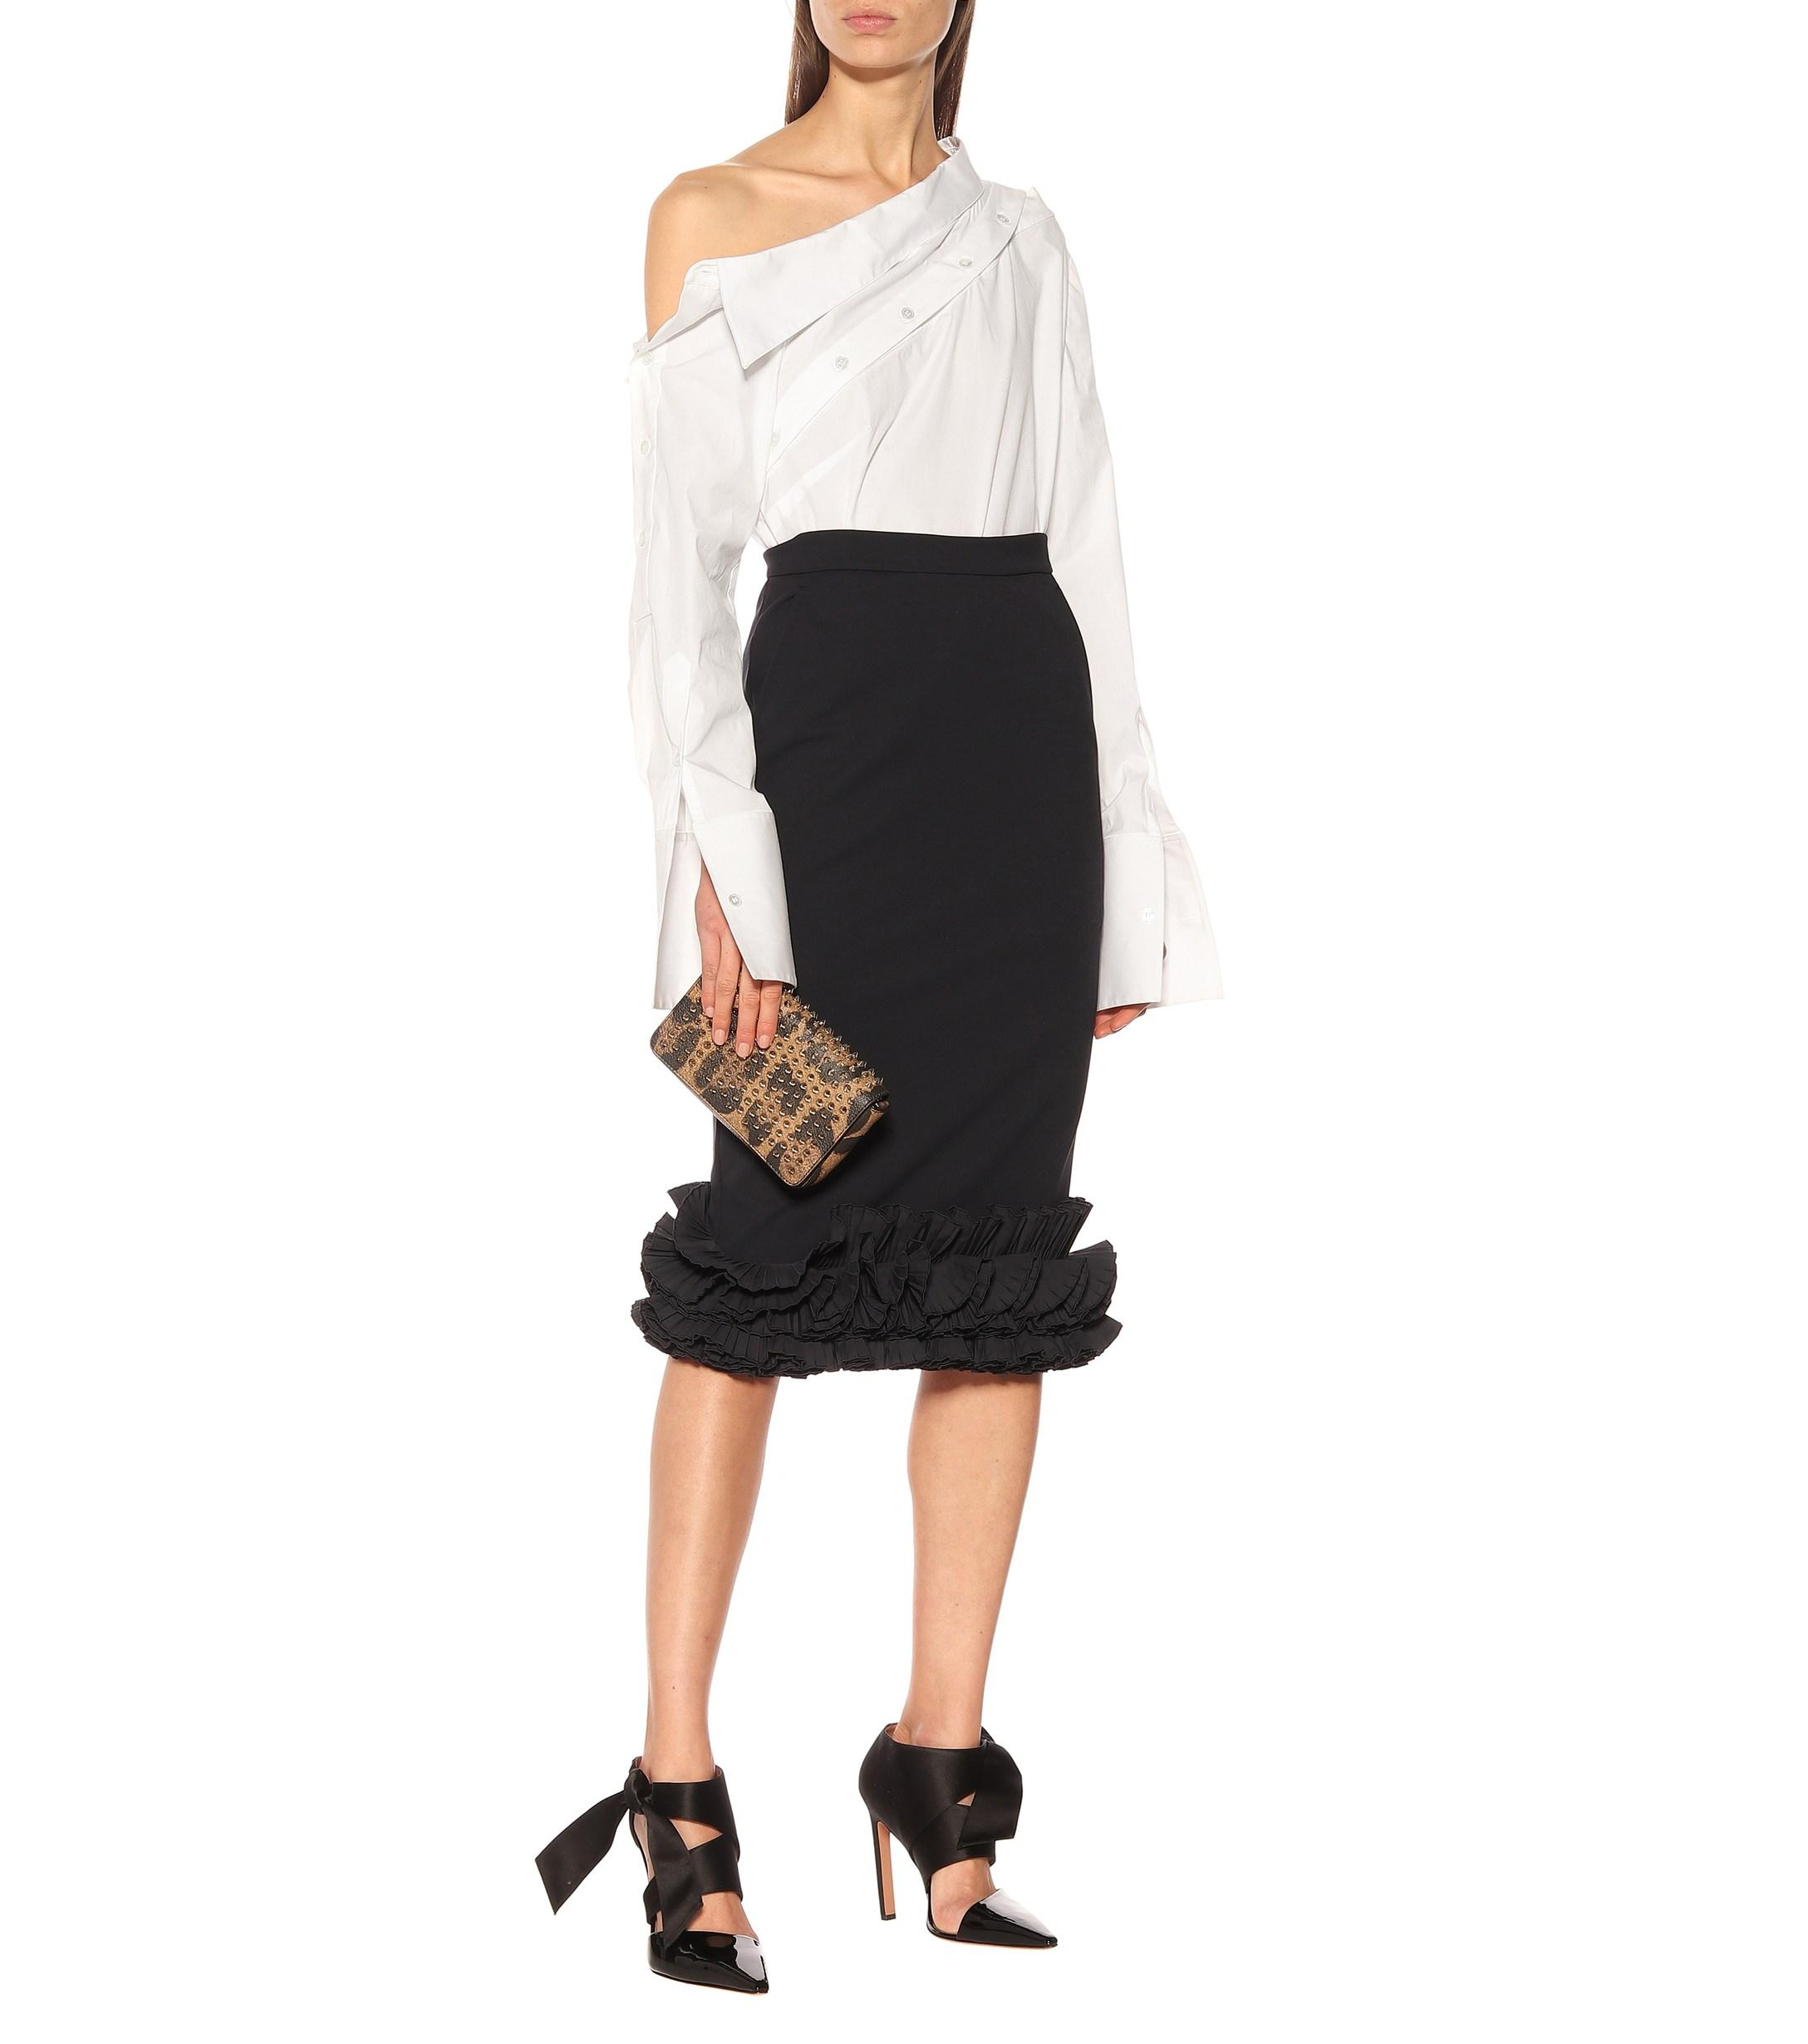 ae2b4536e Lyst - Max Mara Zircone Crêpe Pencil Skirt in Black